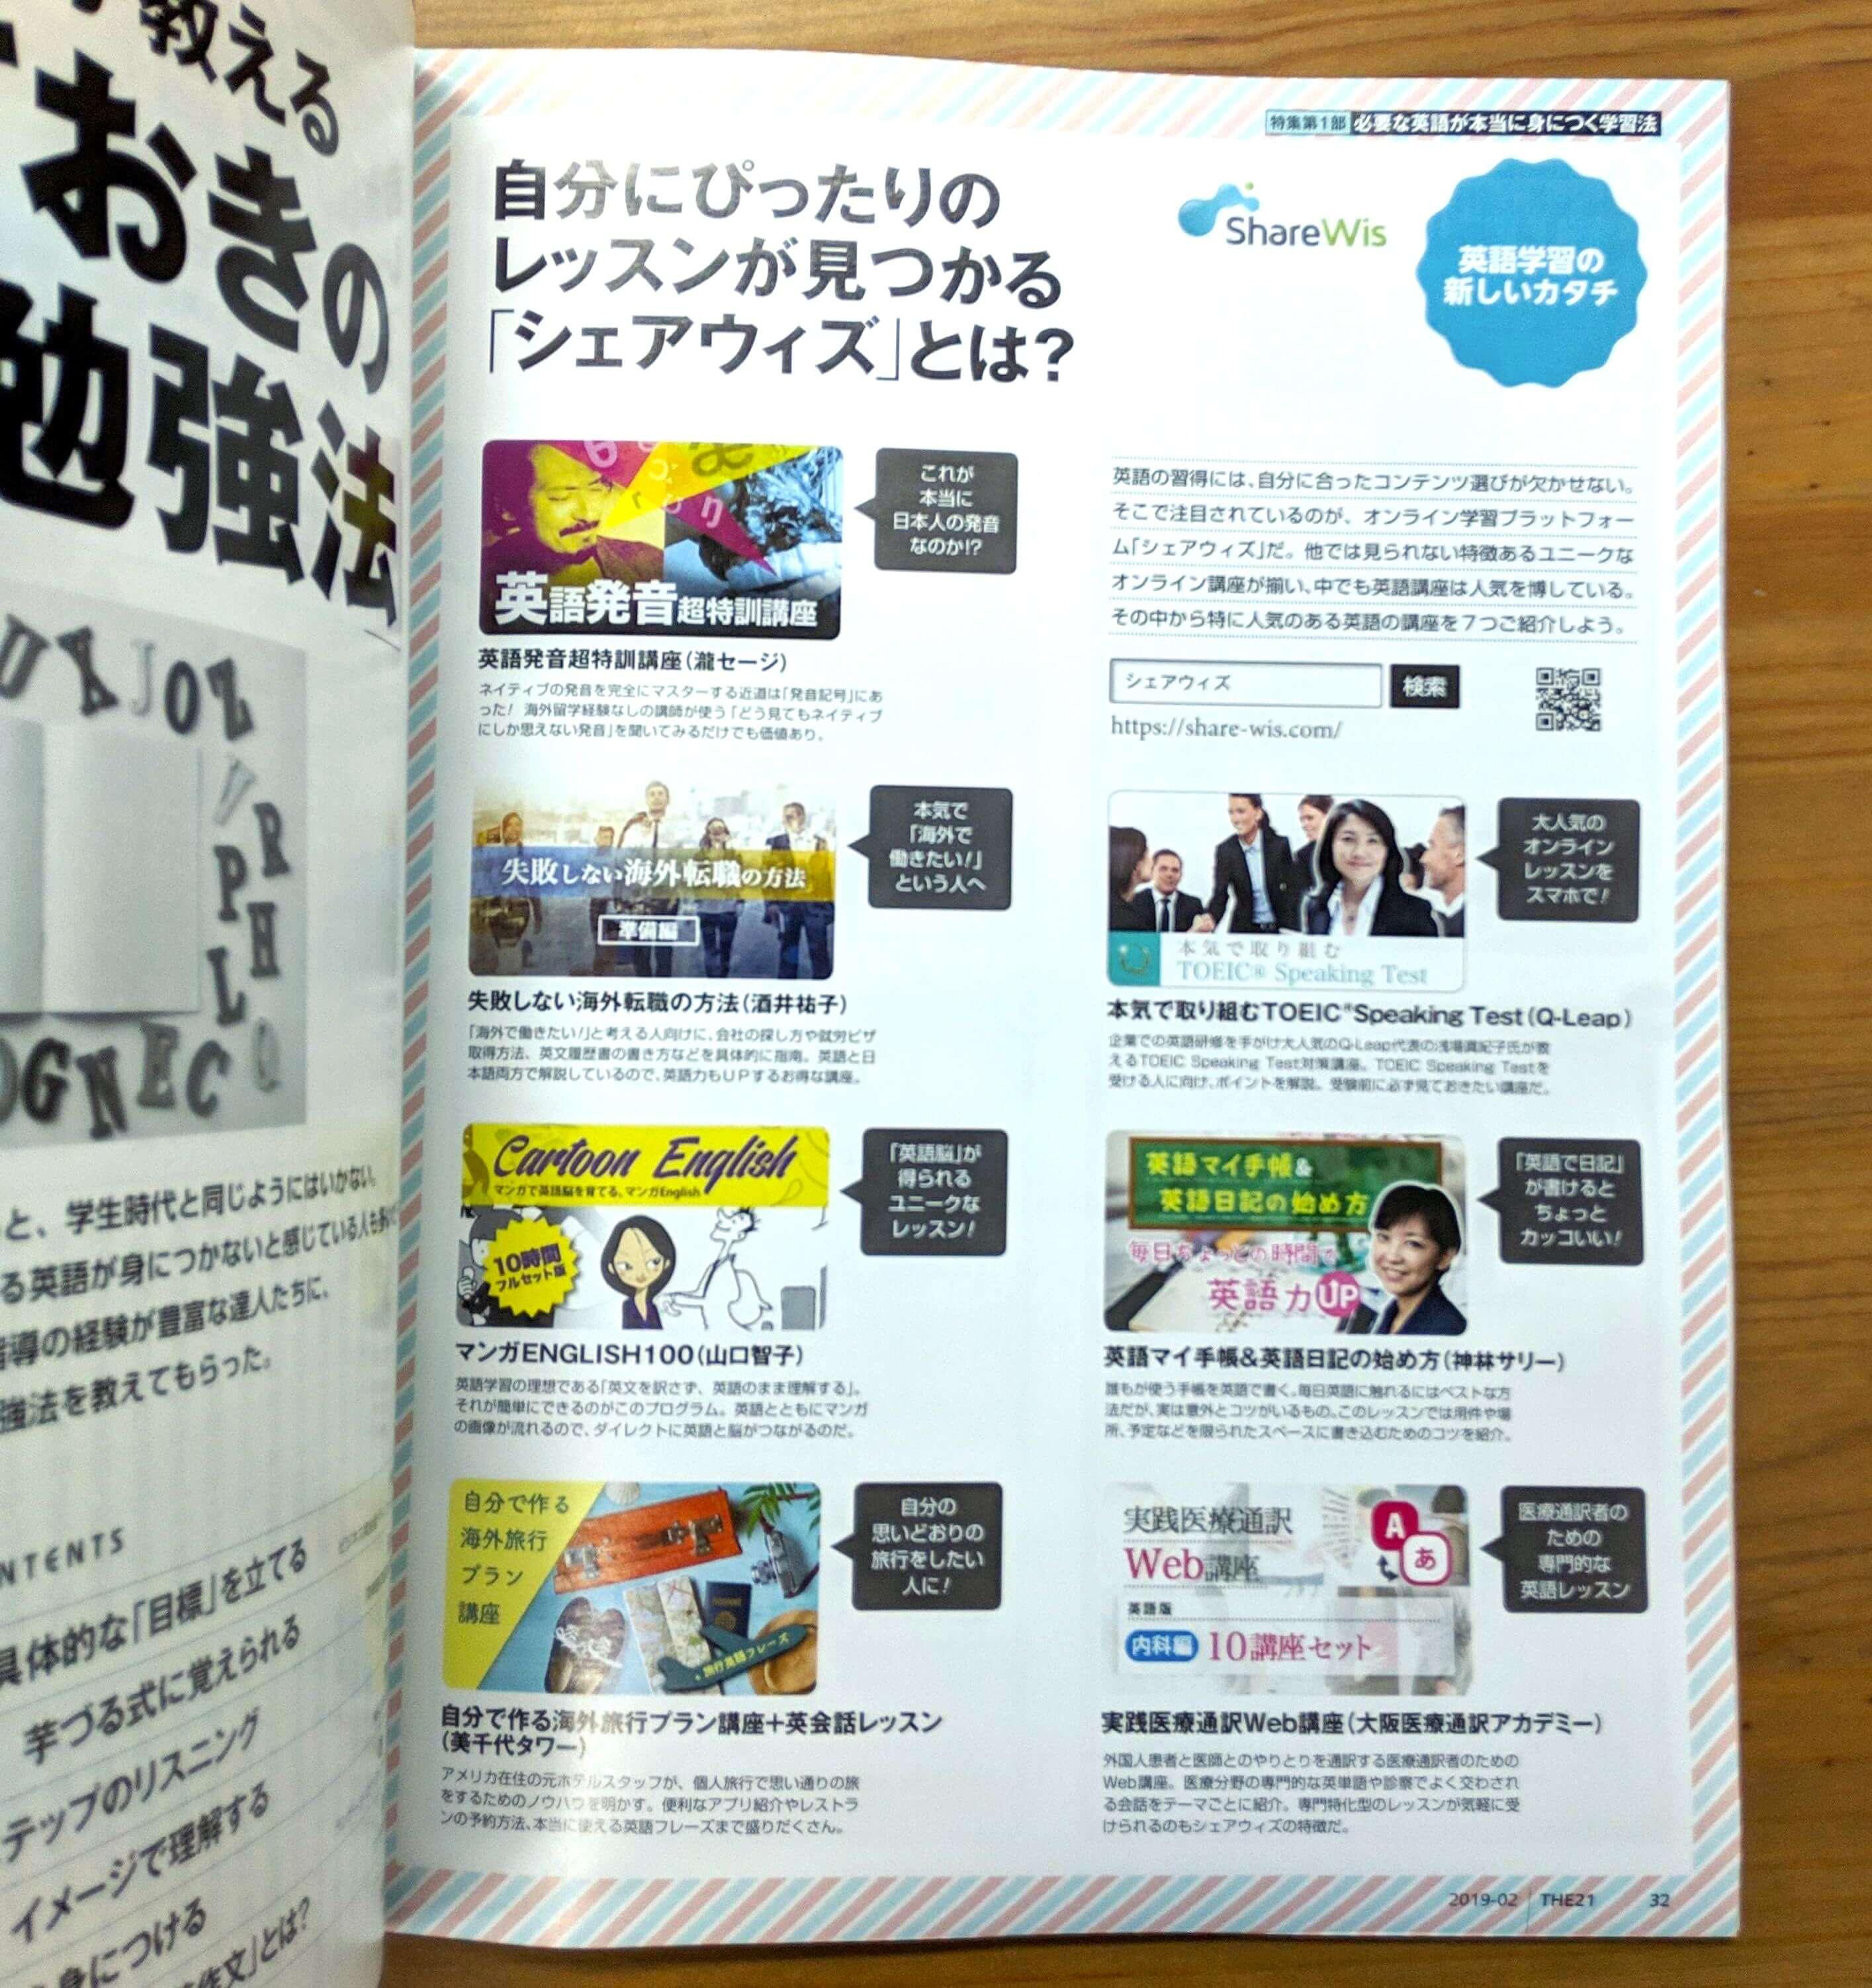 ShareWisの英語コースが紹介されている雑誌THE 21(株式会社PHP研究所)の掲載ページの拡大画像